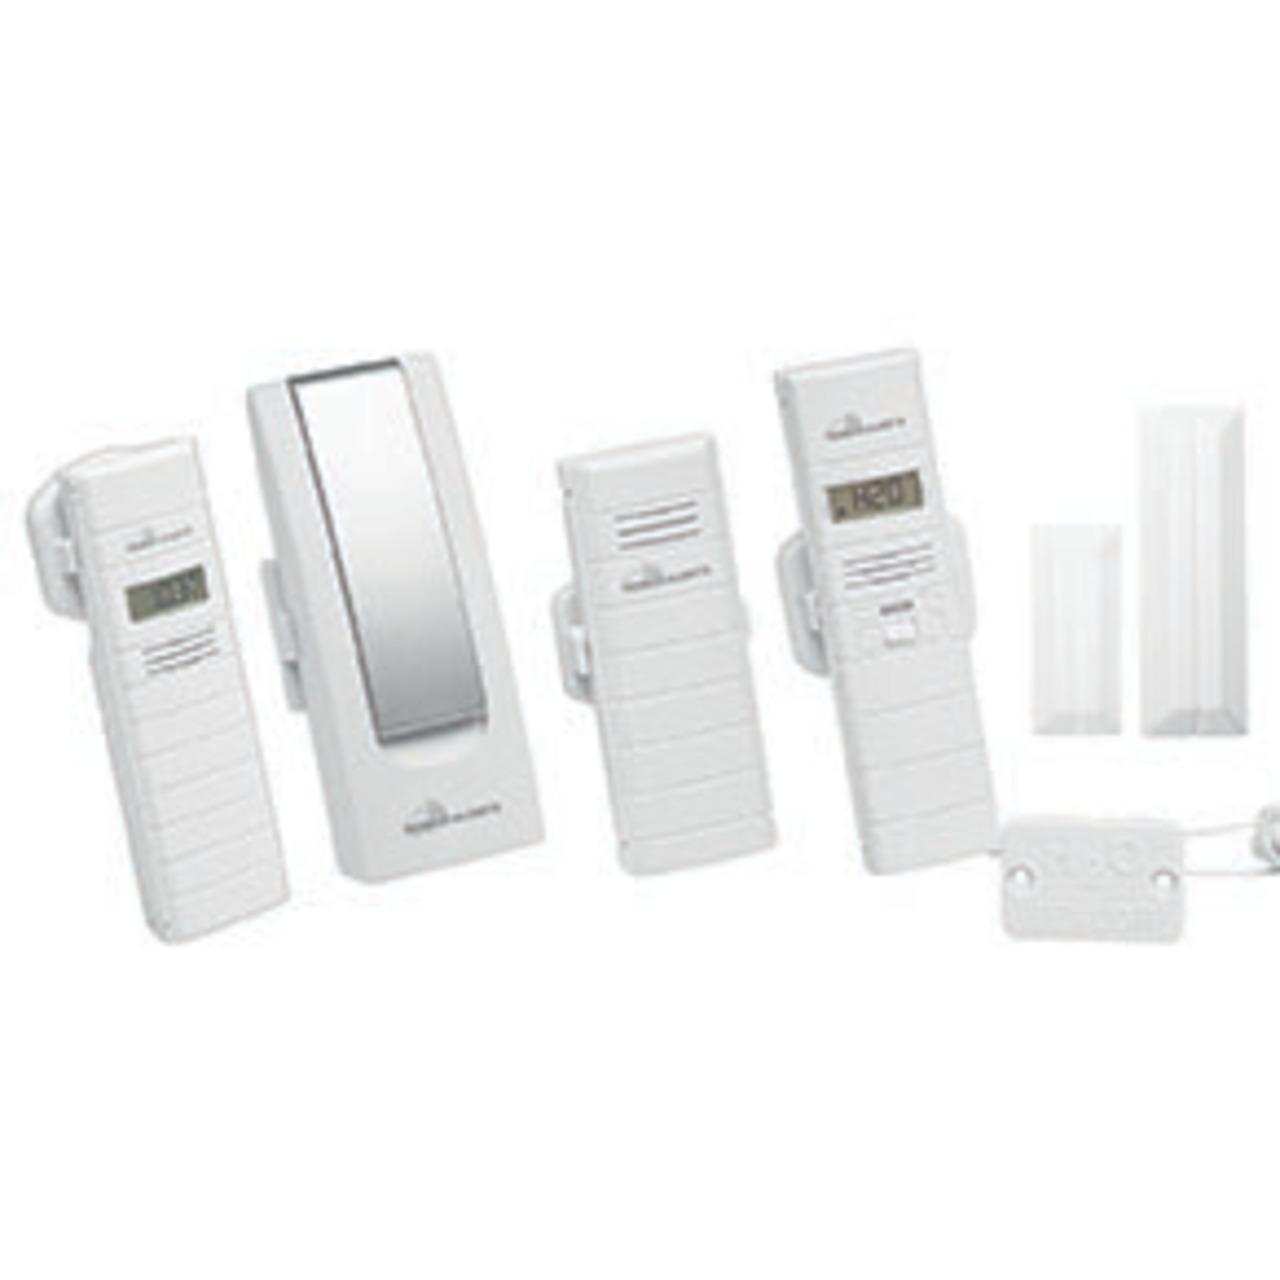 ELV Mobile Alerts Wetterset (Gateway- Temperatursensor- 2x Thermo-Hygrosensor- Fensterkontakt)